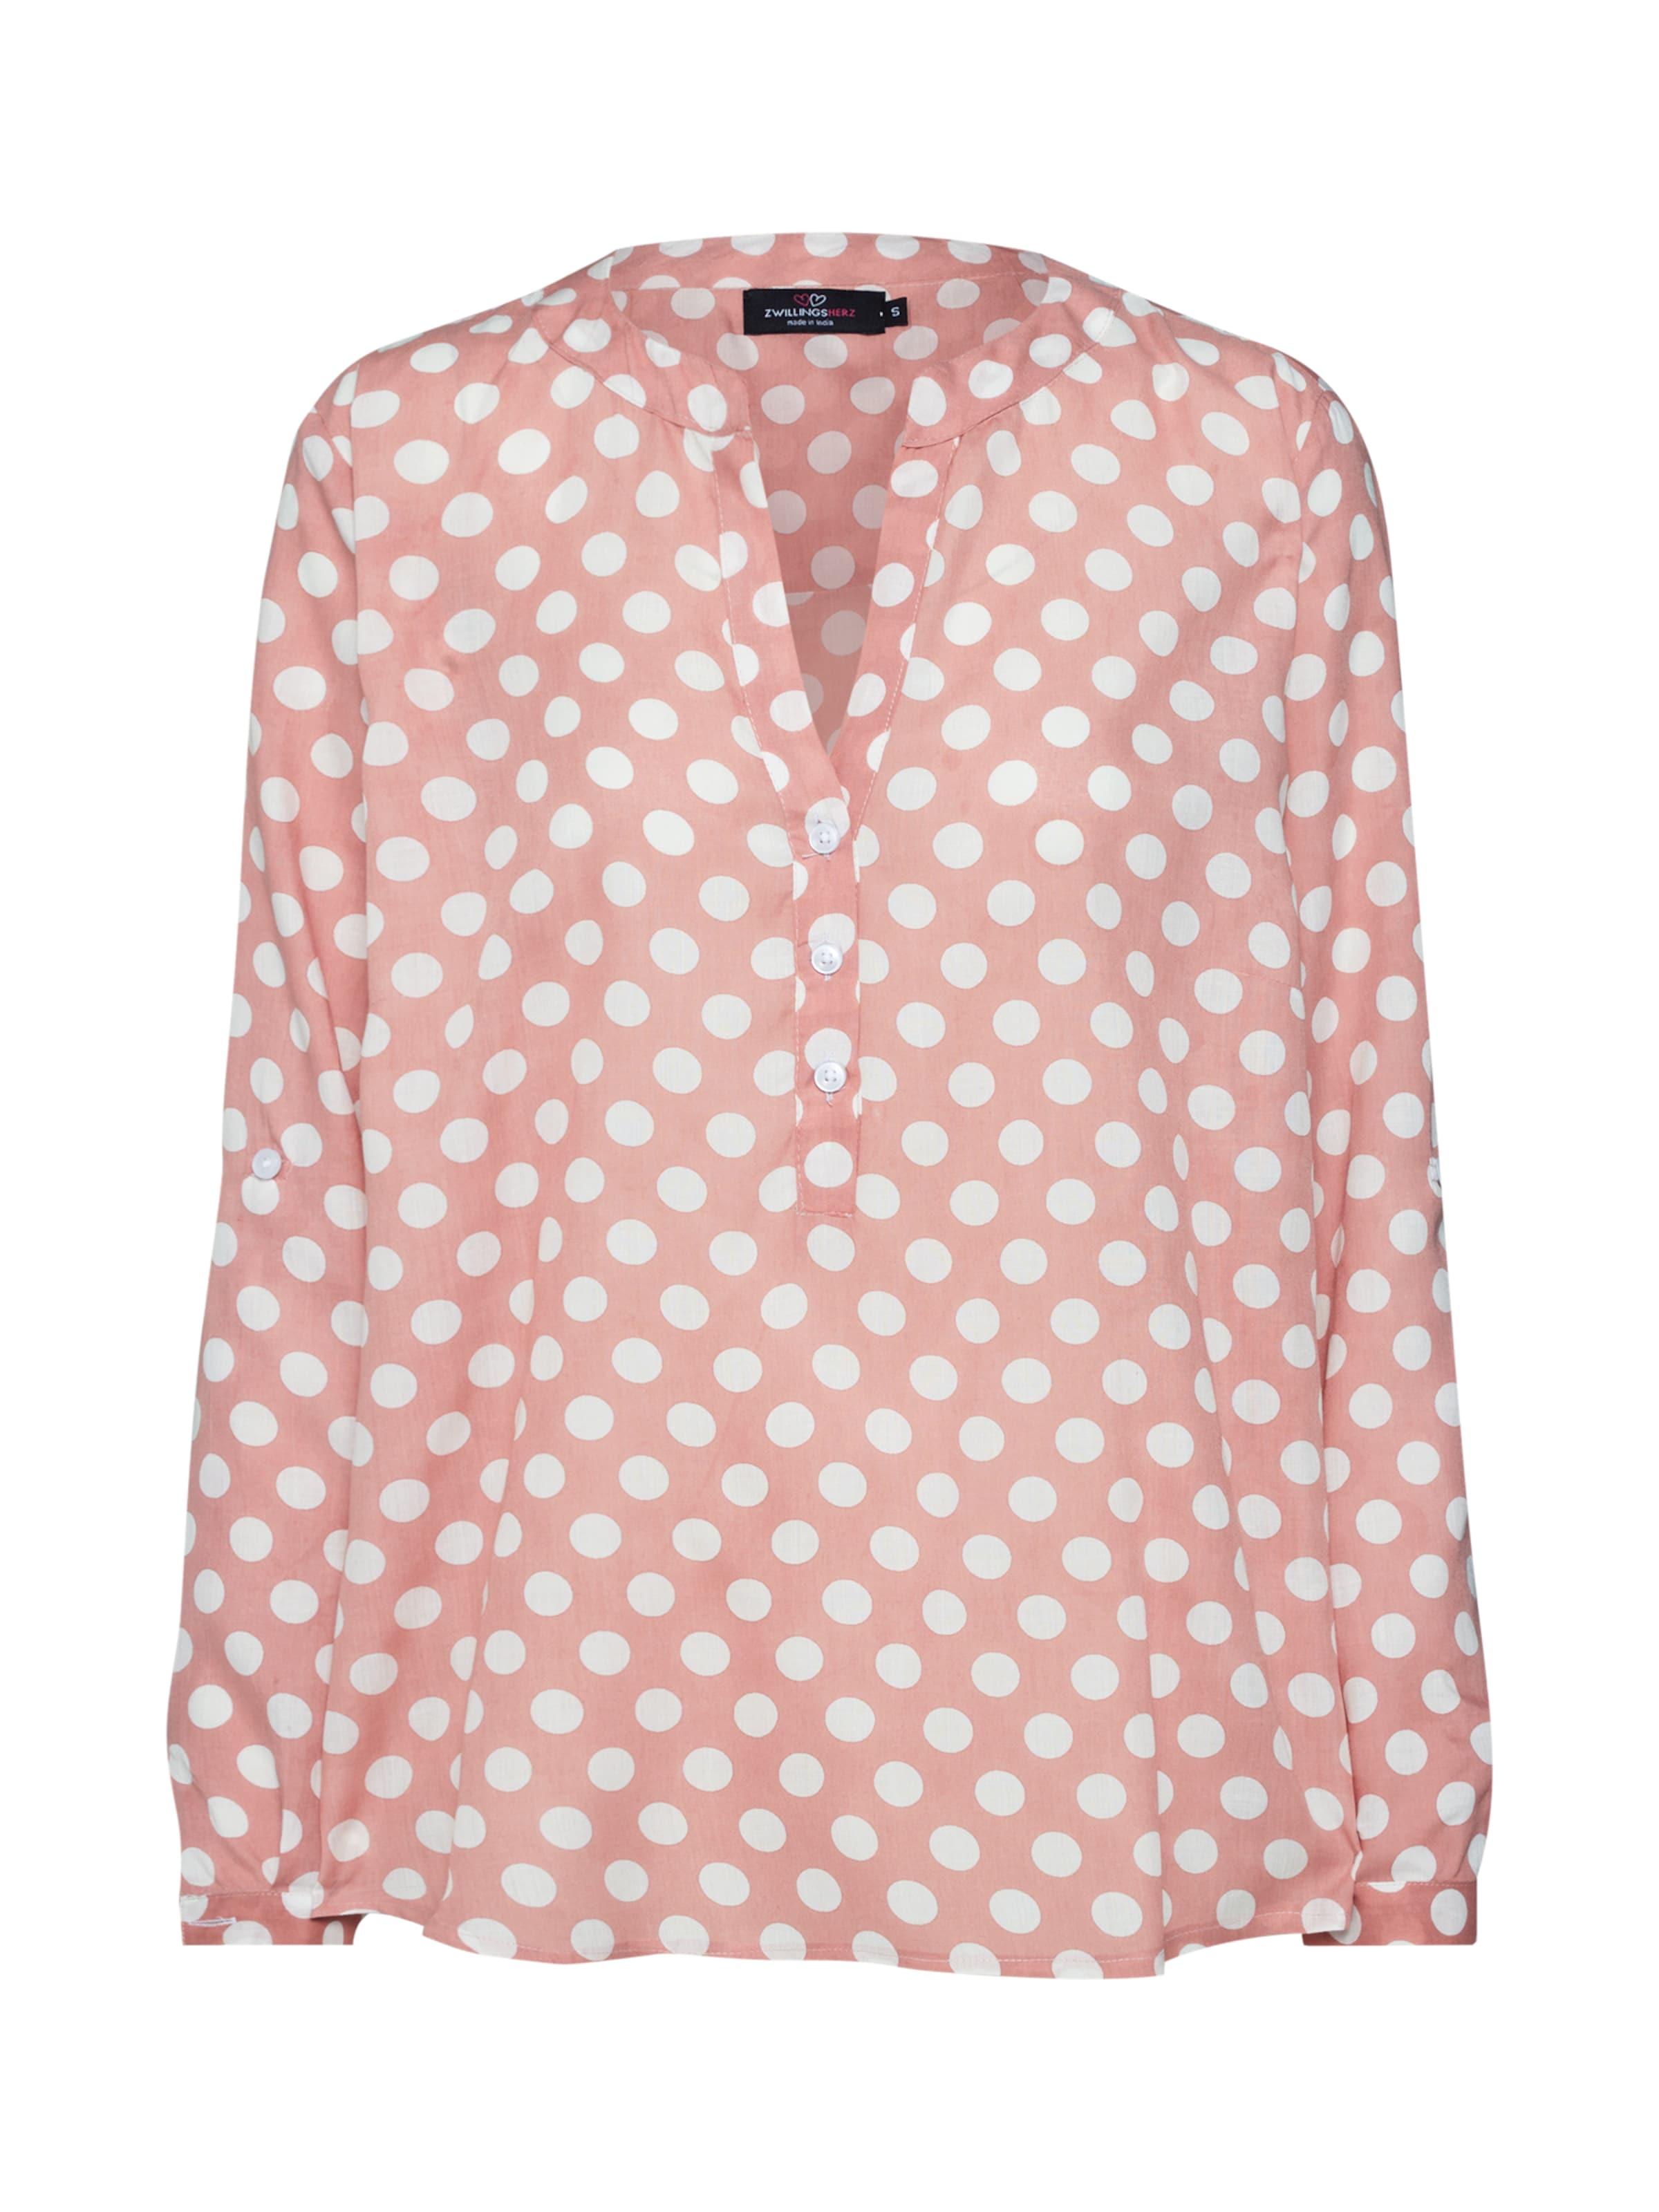 Bluse In Zwillingsherz Zwillingsherz In RosaWeiß RosaWeiß In Bluse Zwillingsherz Bluse N8mn0w